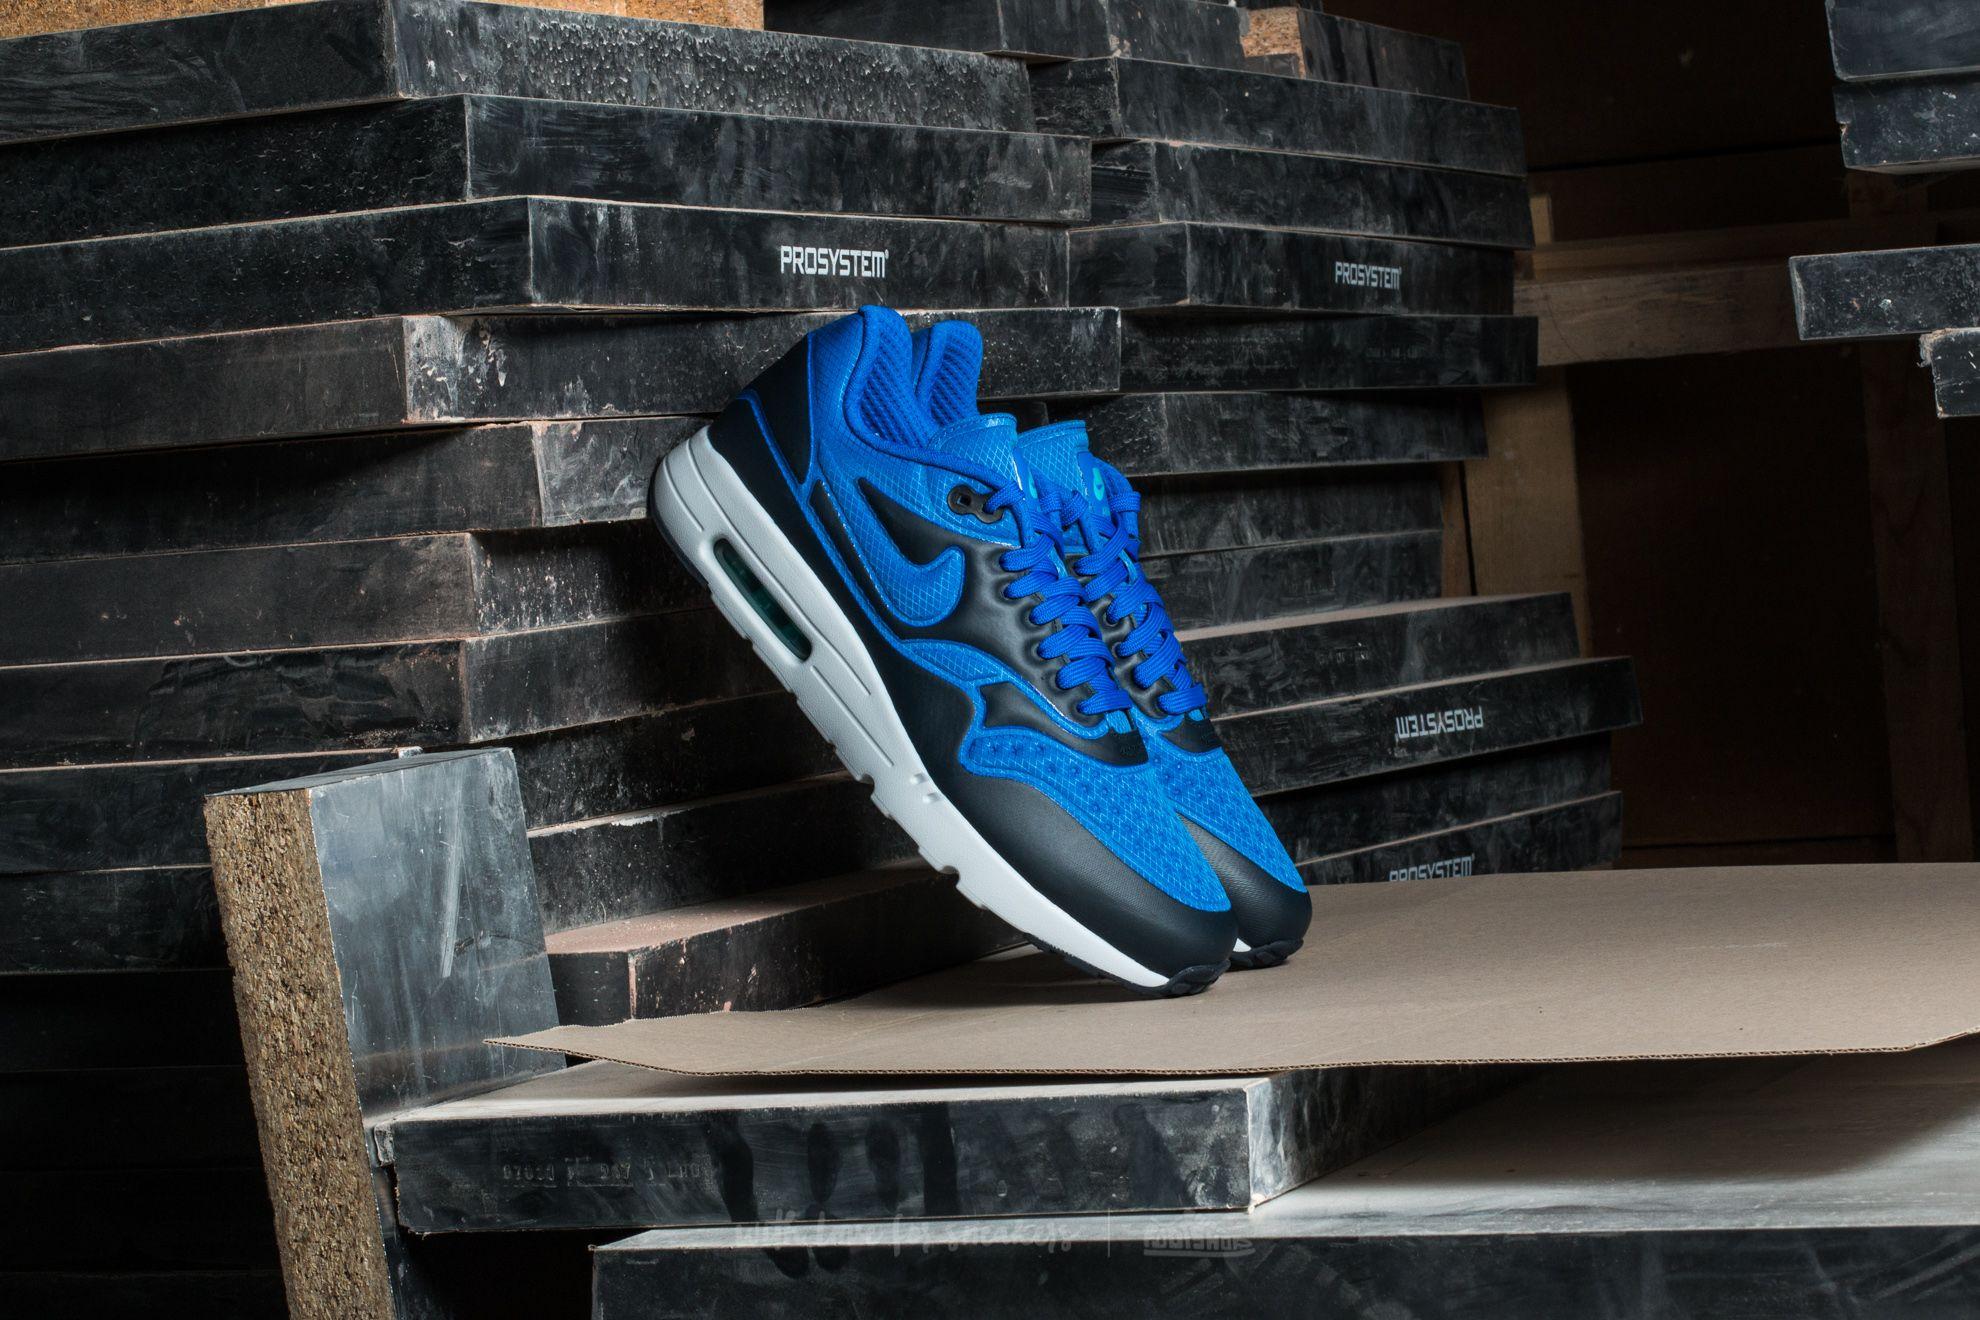 Nike Air Max 1 Ultra SE Hyper Cobalt/ Dark Obsidian